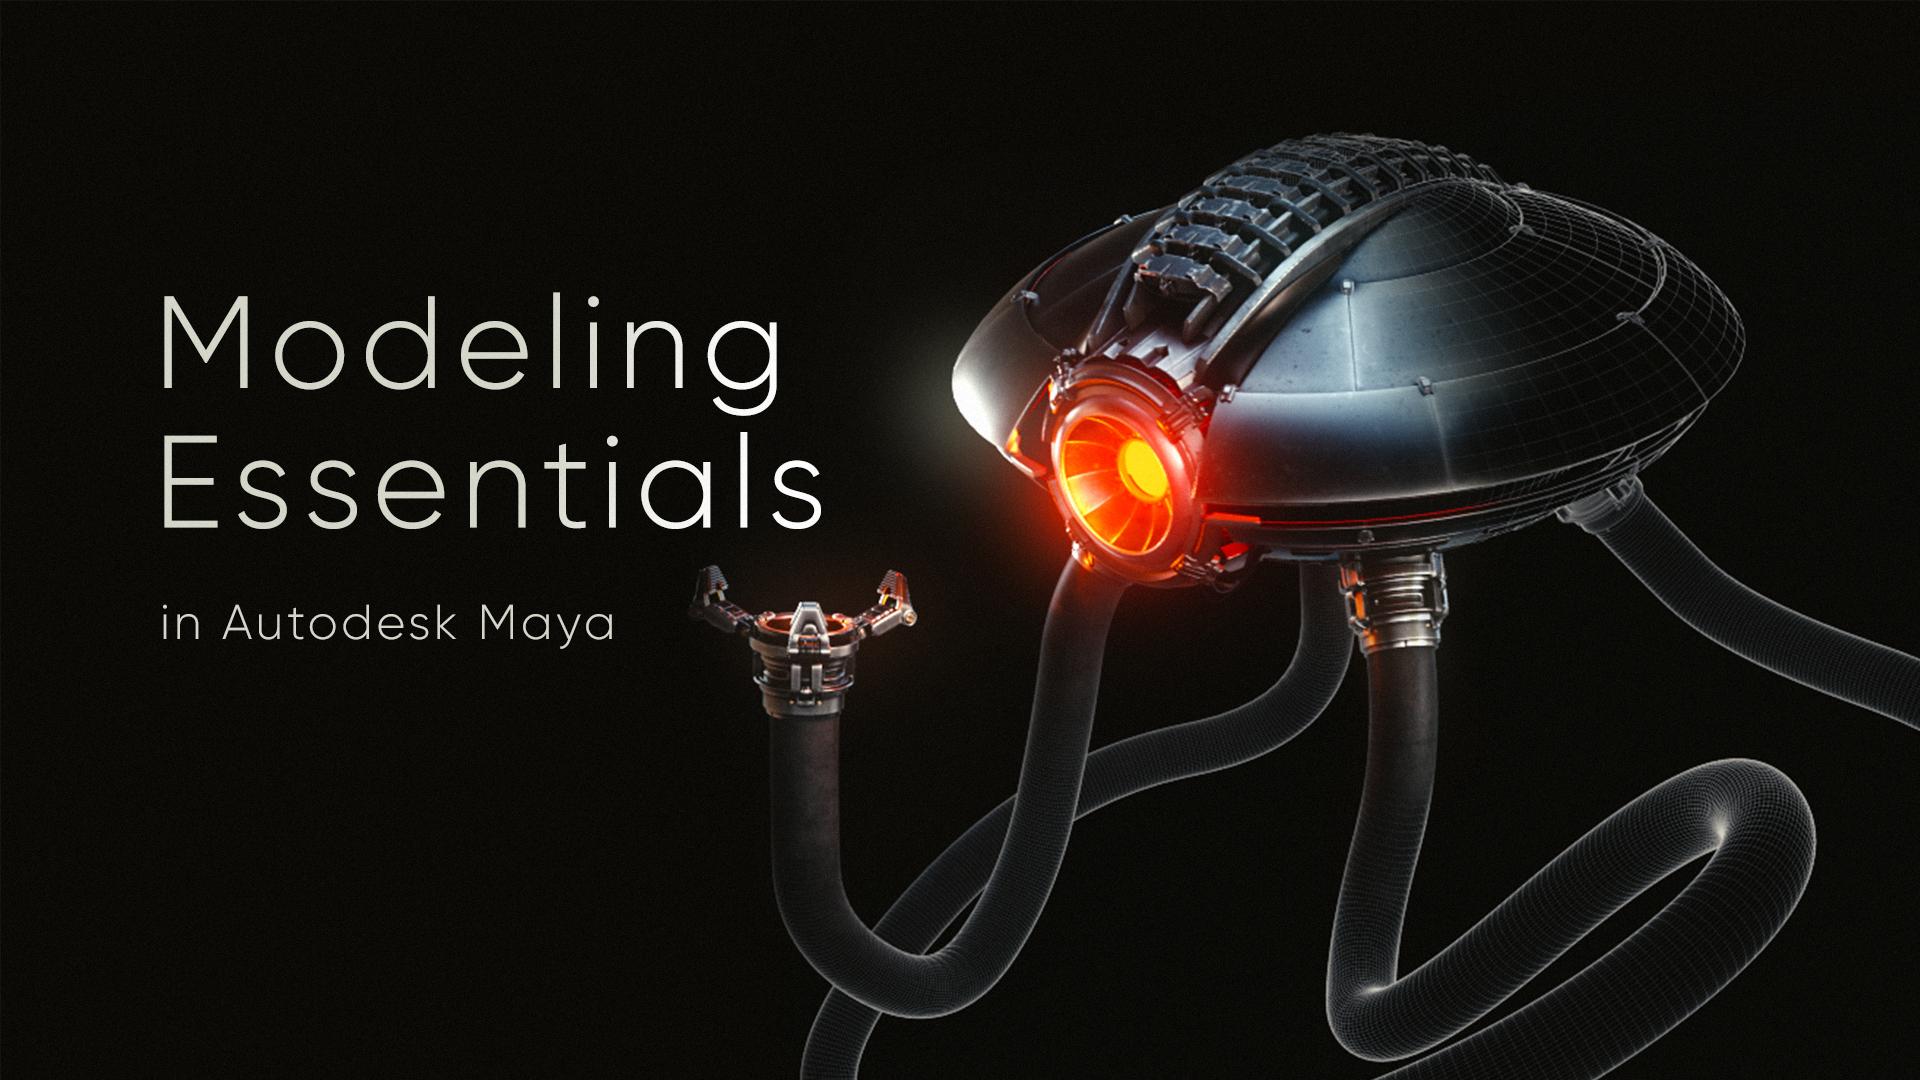 Modeling Essentials in Autodesk Maya